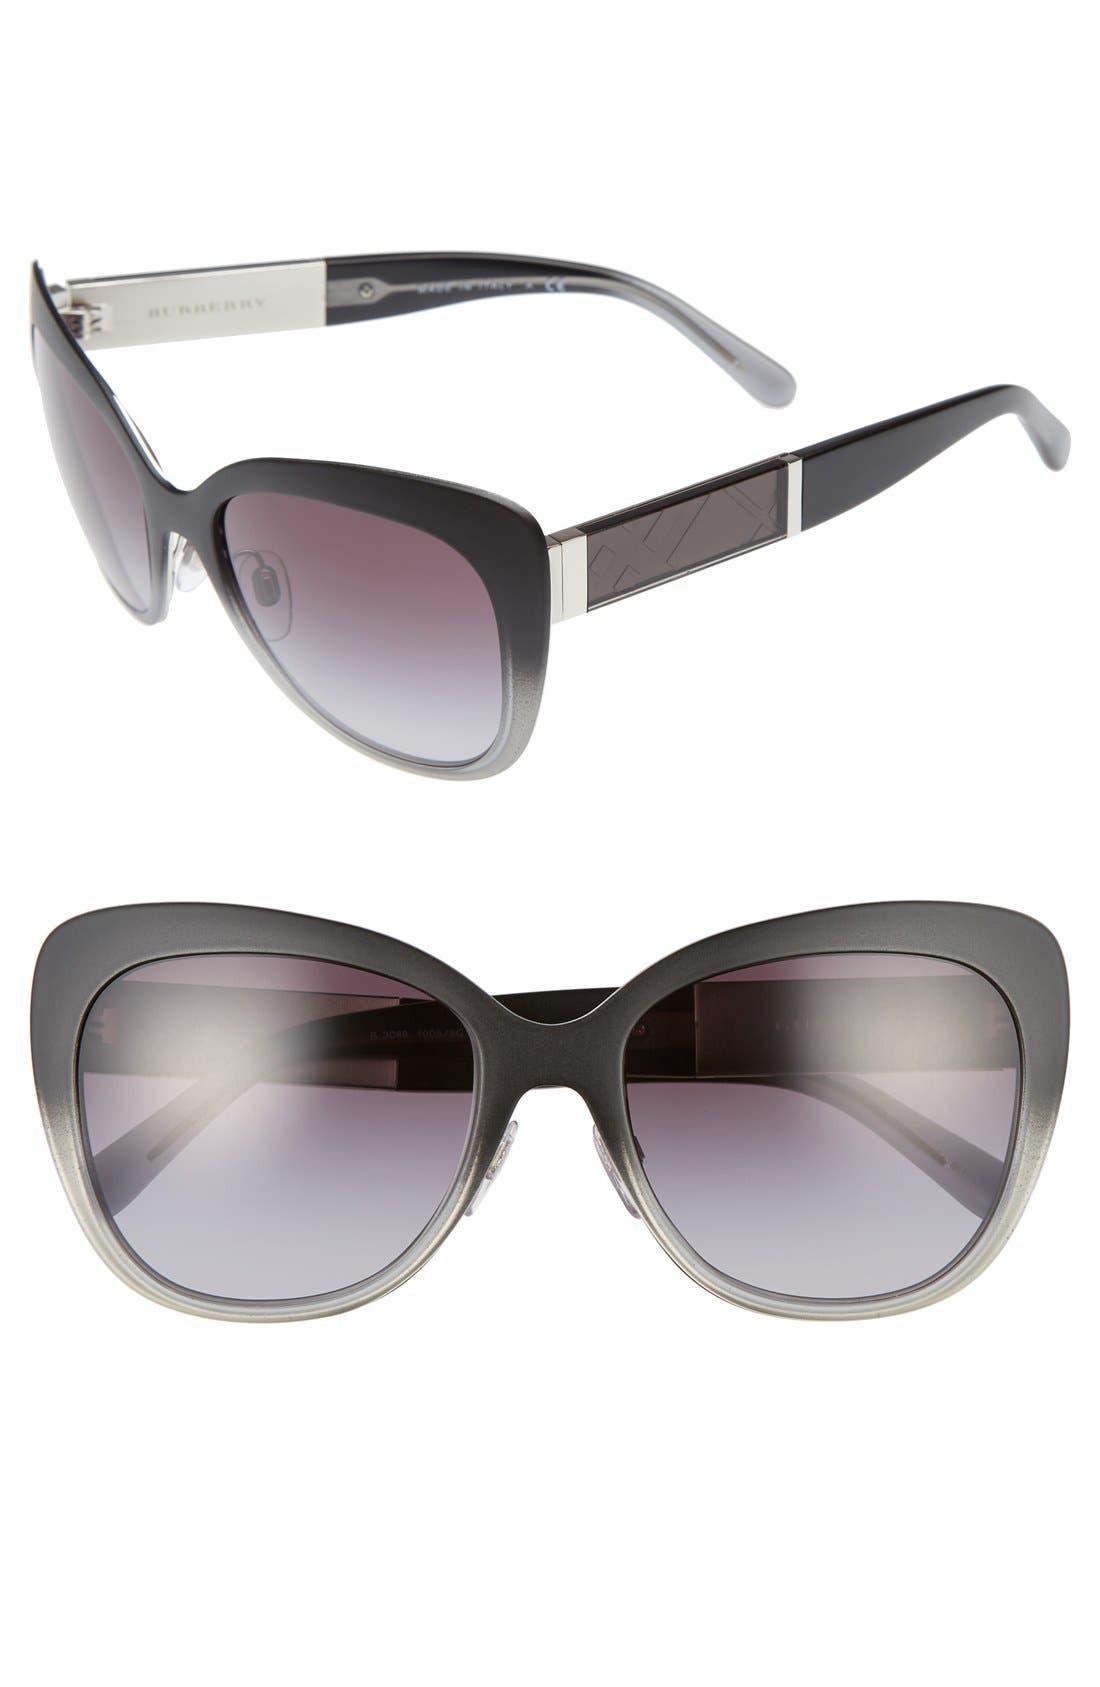 Main Image - Burberry 57mm Cat Eye Sunglasses